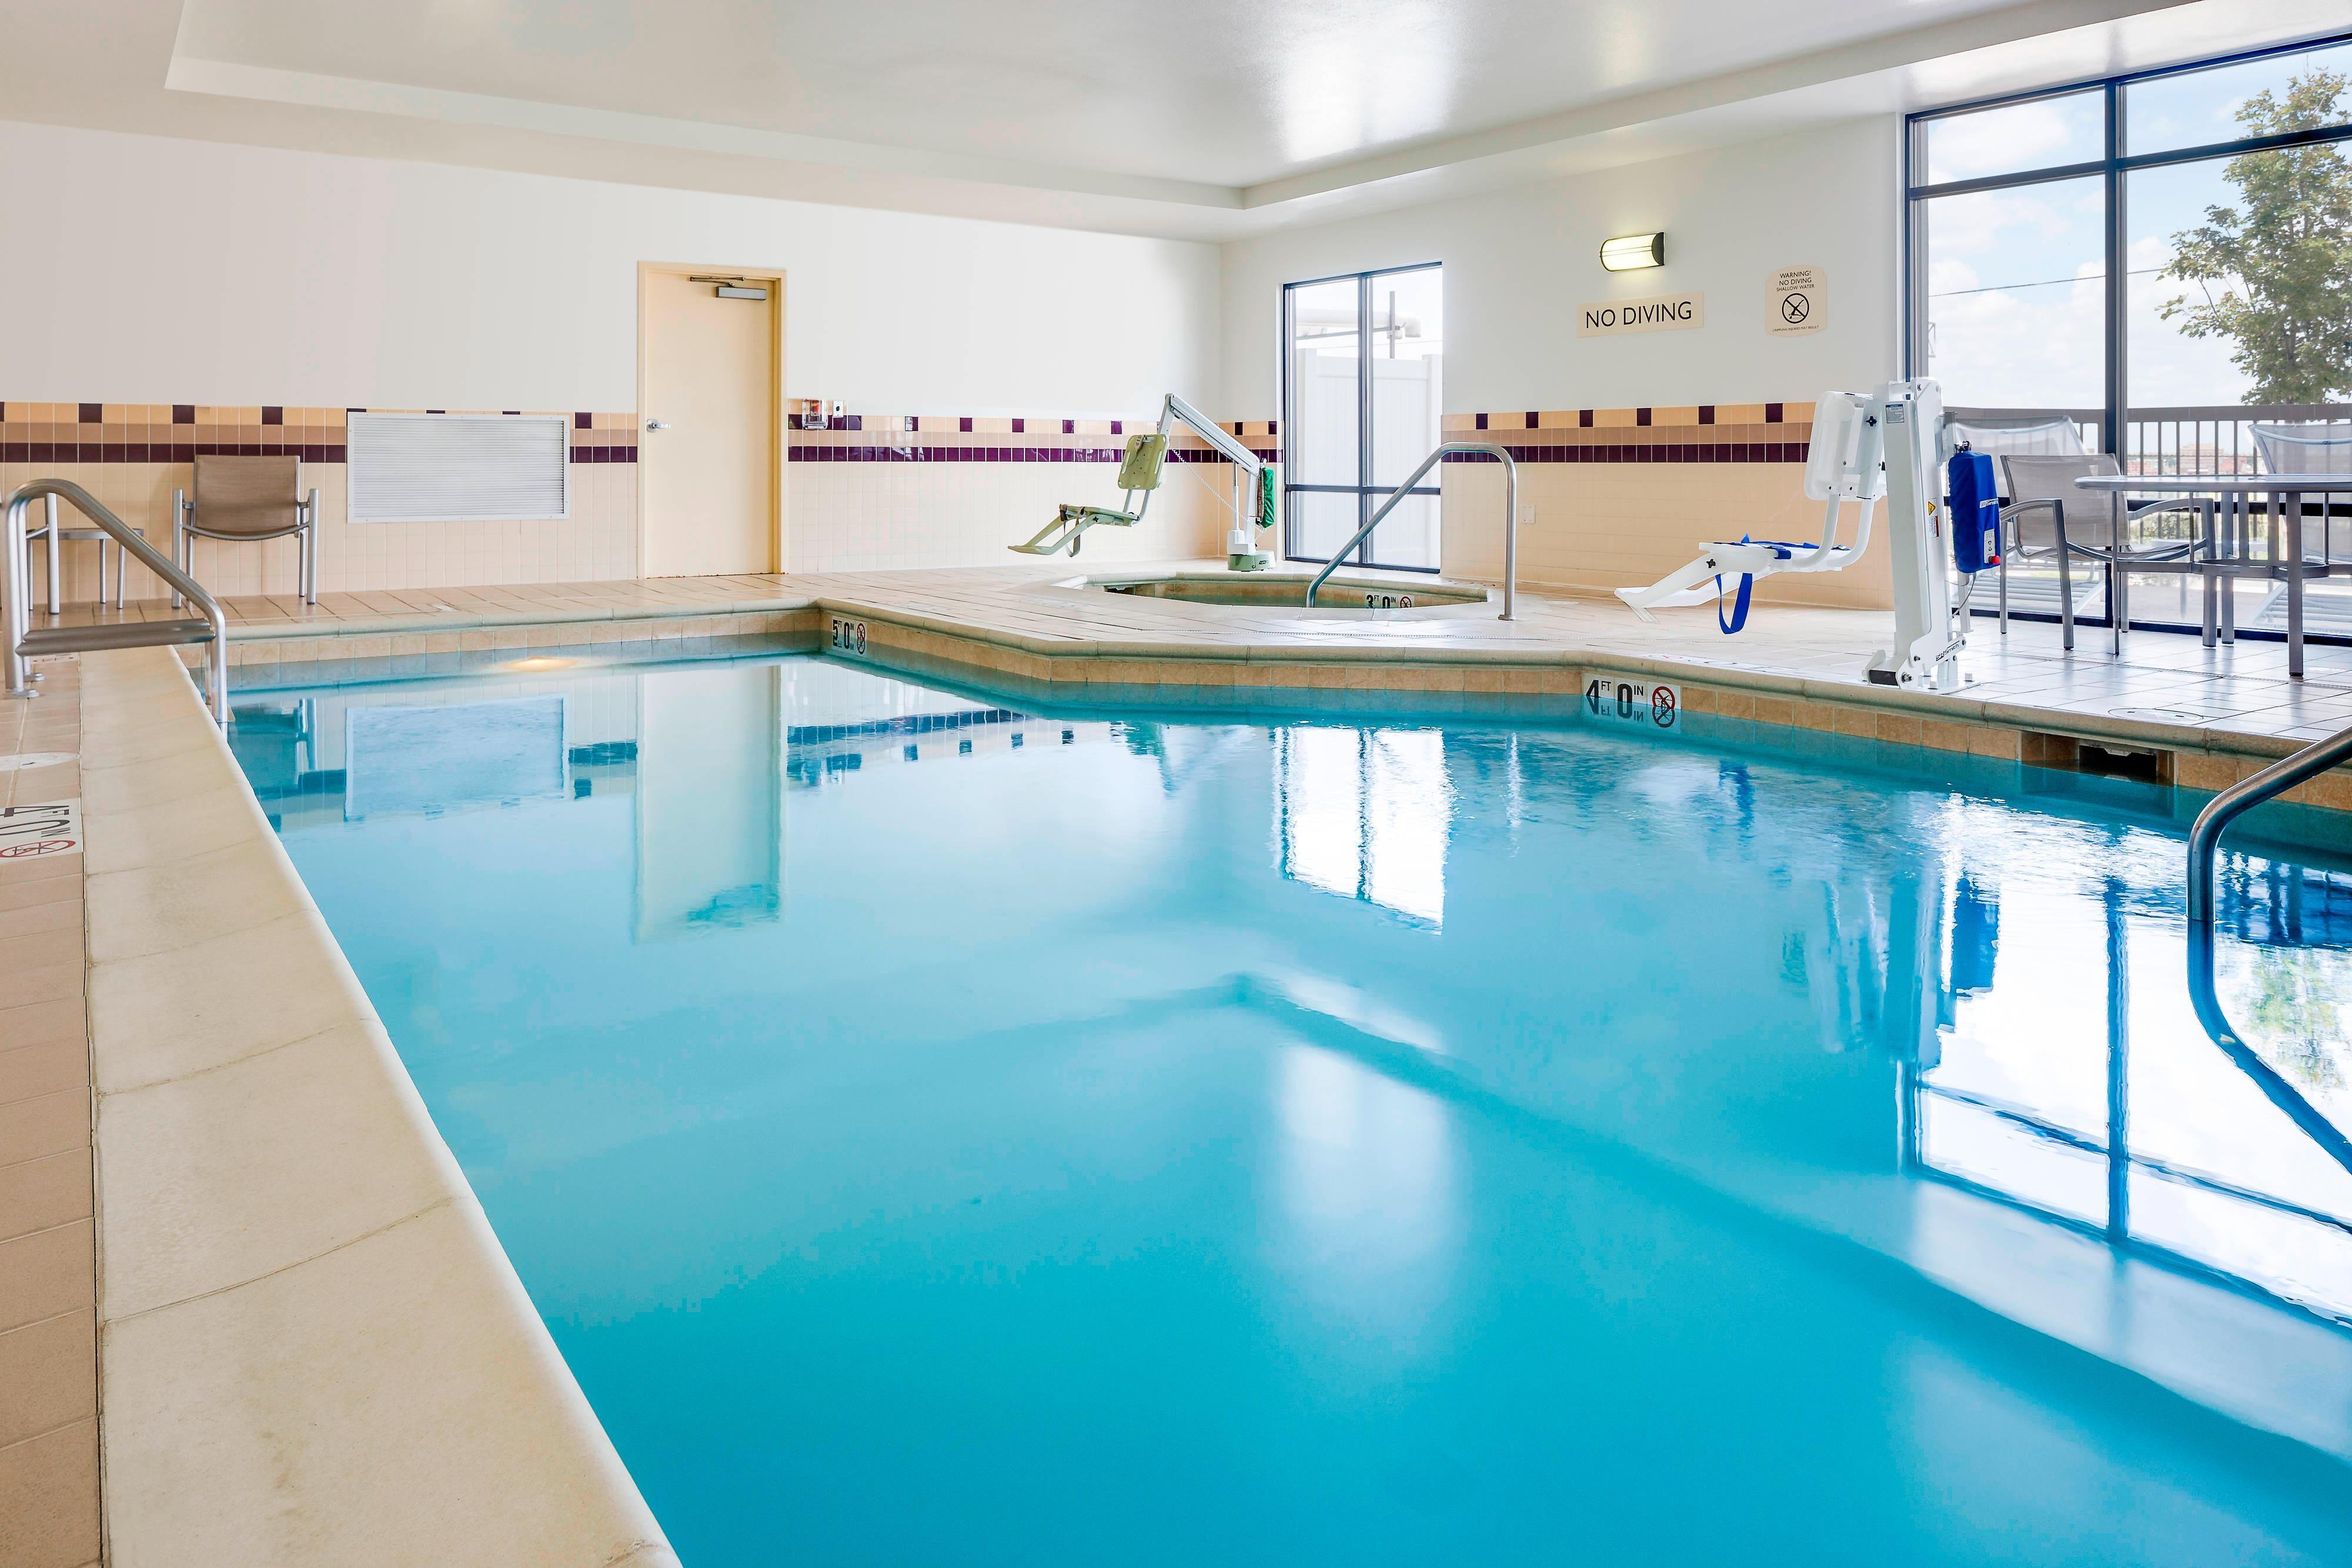 Swimming pool in Cheyenne hotel